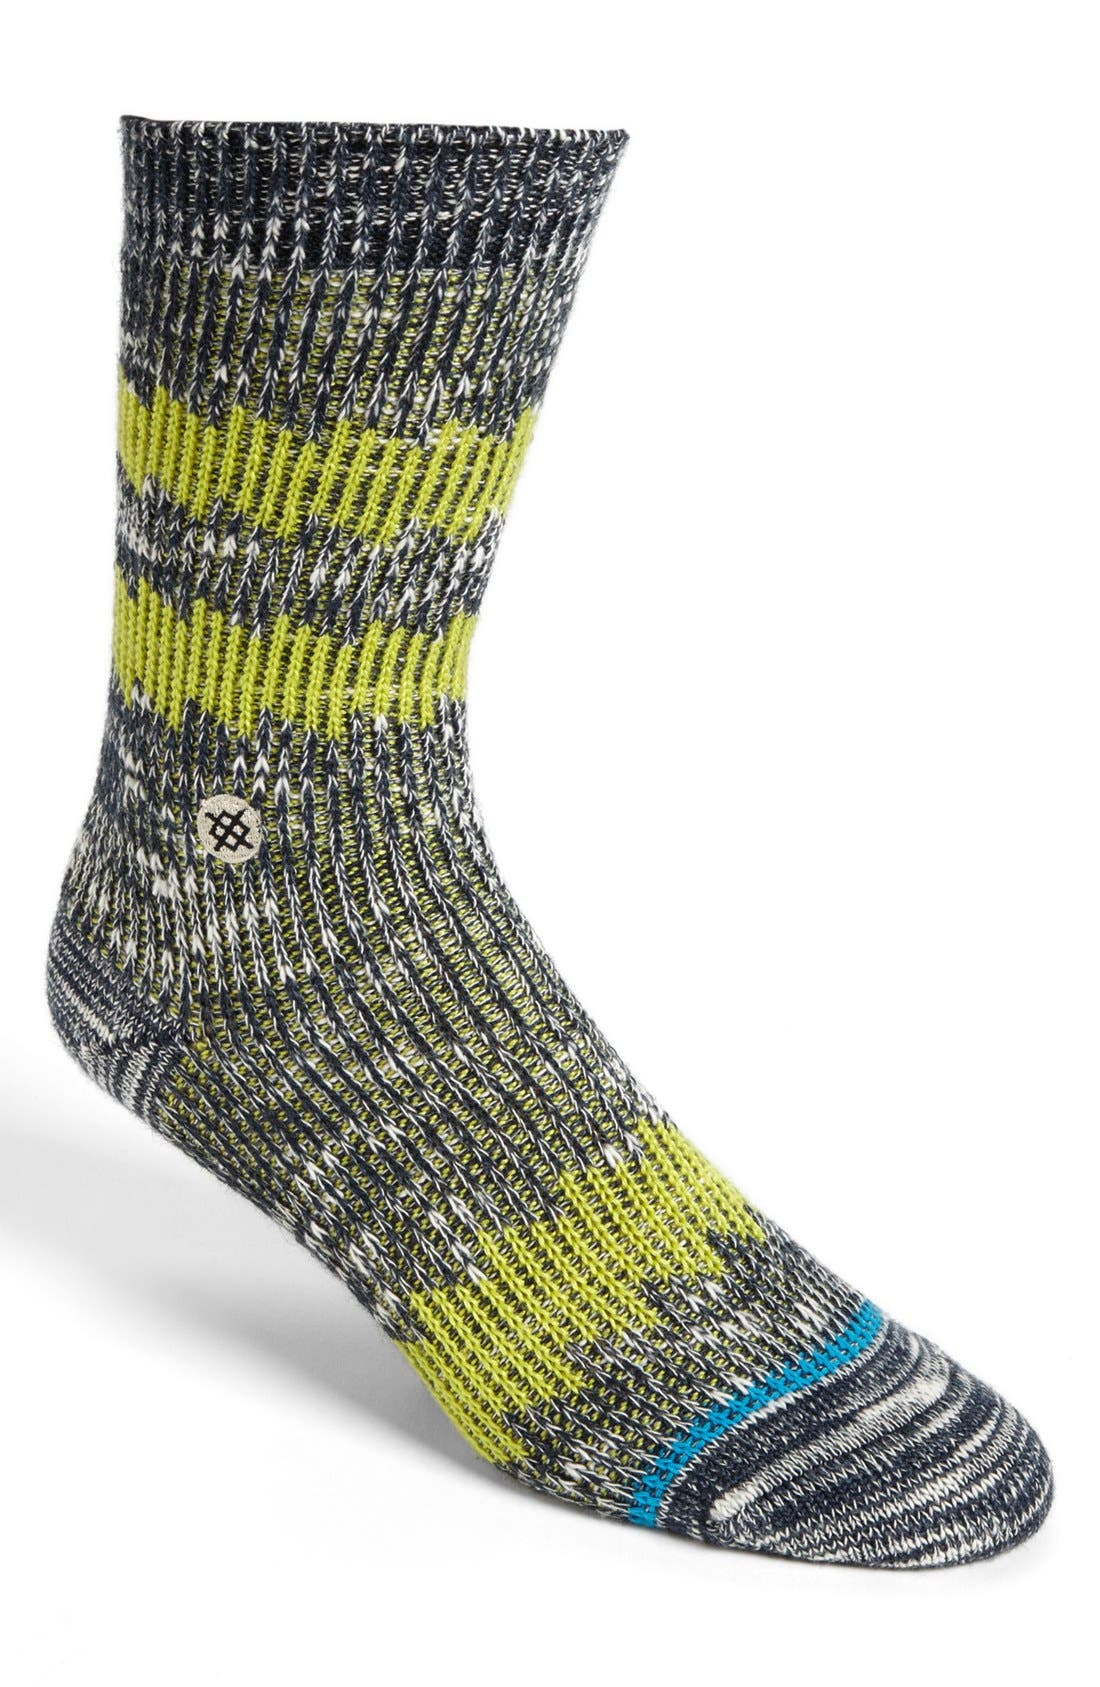 Alternate Image 1 Selected - Stance 'Sawtooth' Socks